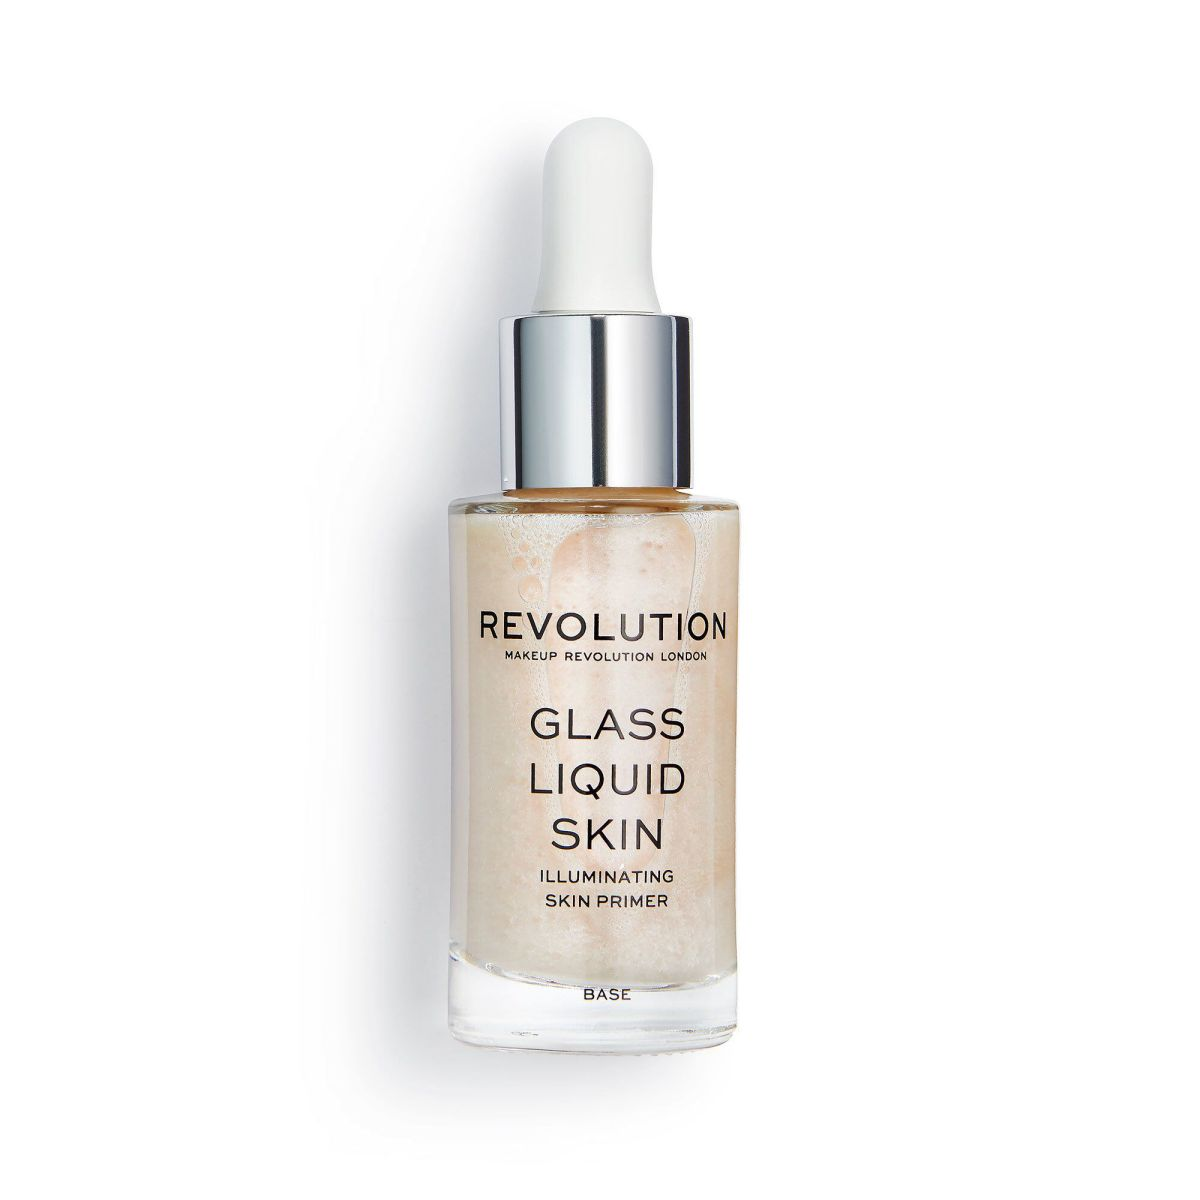 Glass Liquid Skin Illuminating Primer Serum